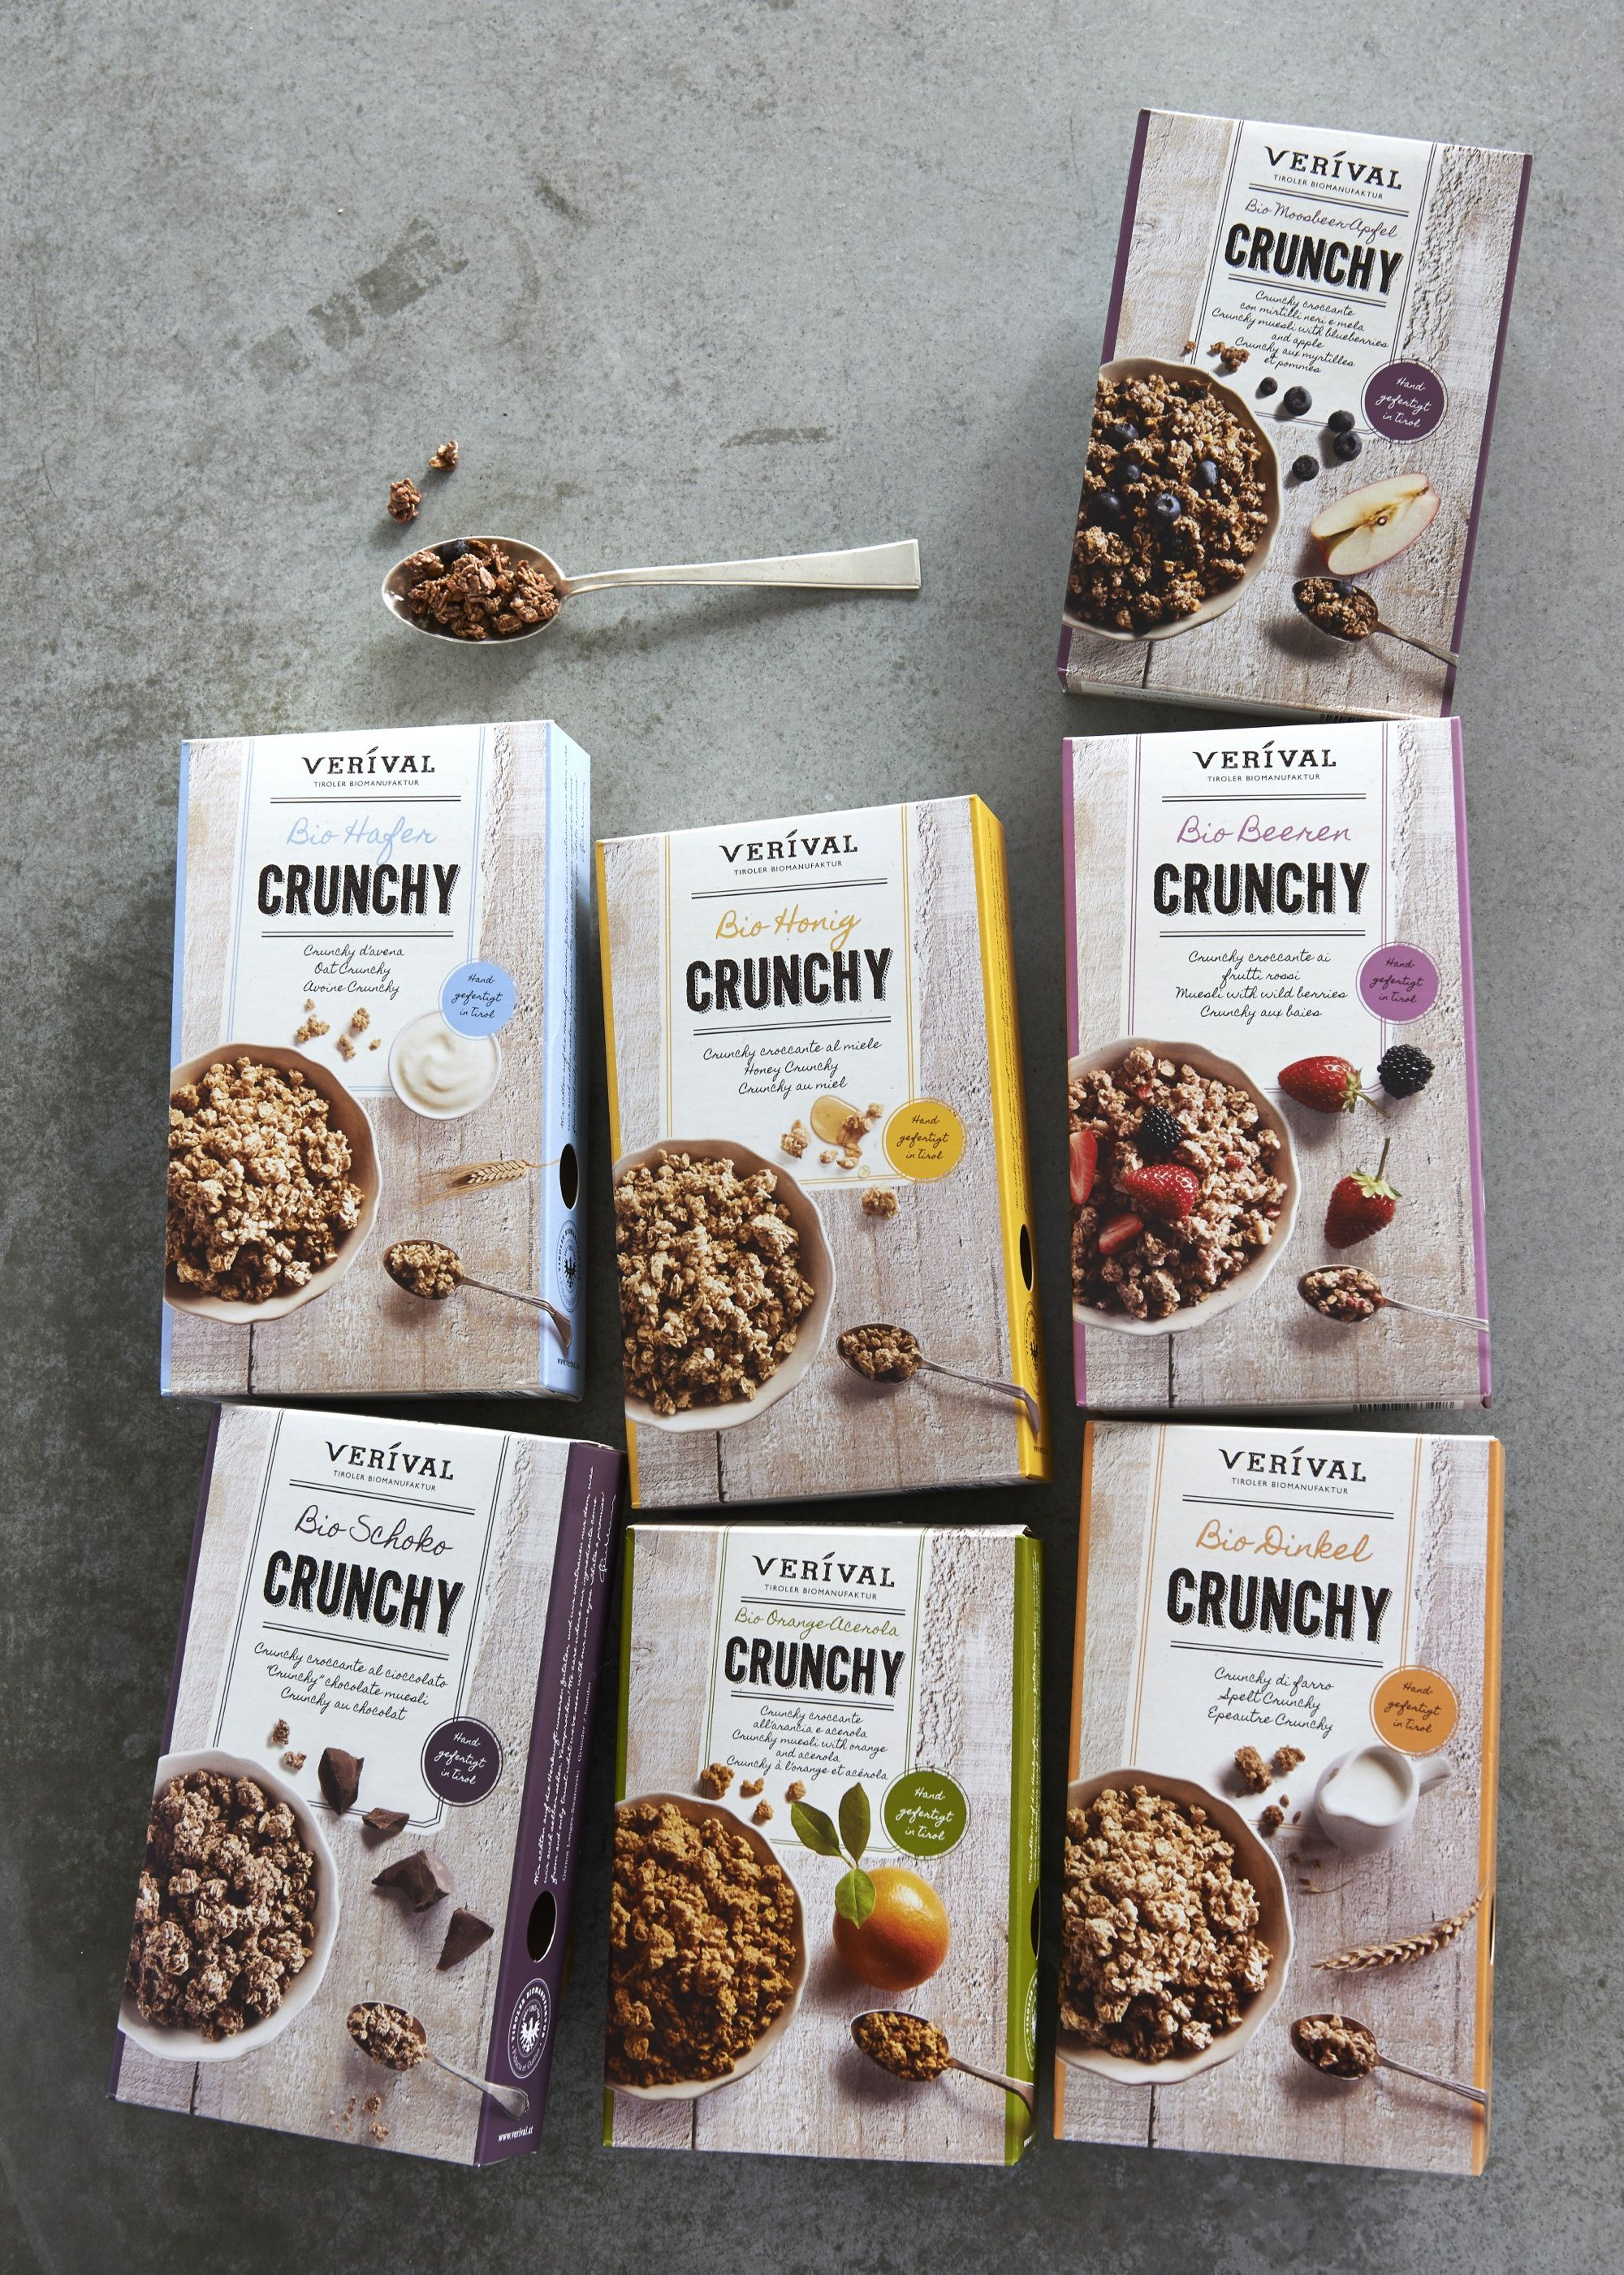 Verival Crunchies